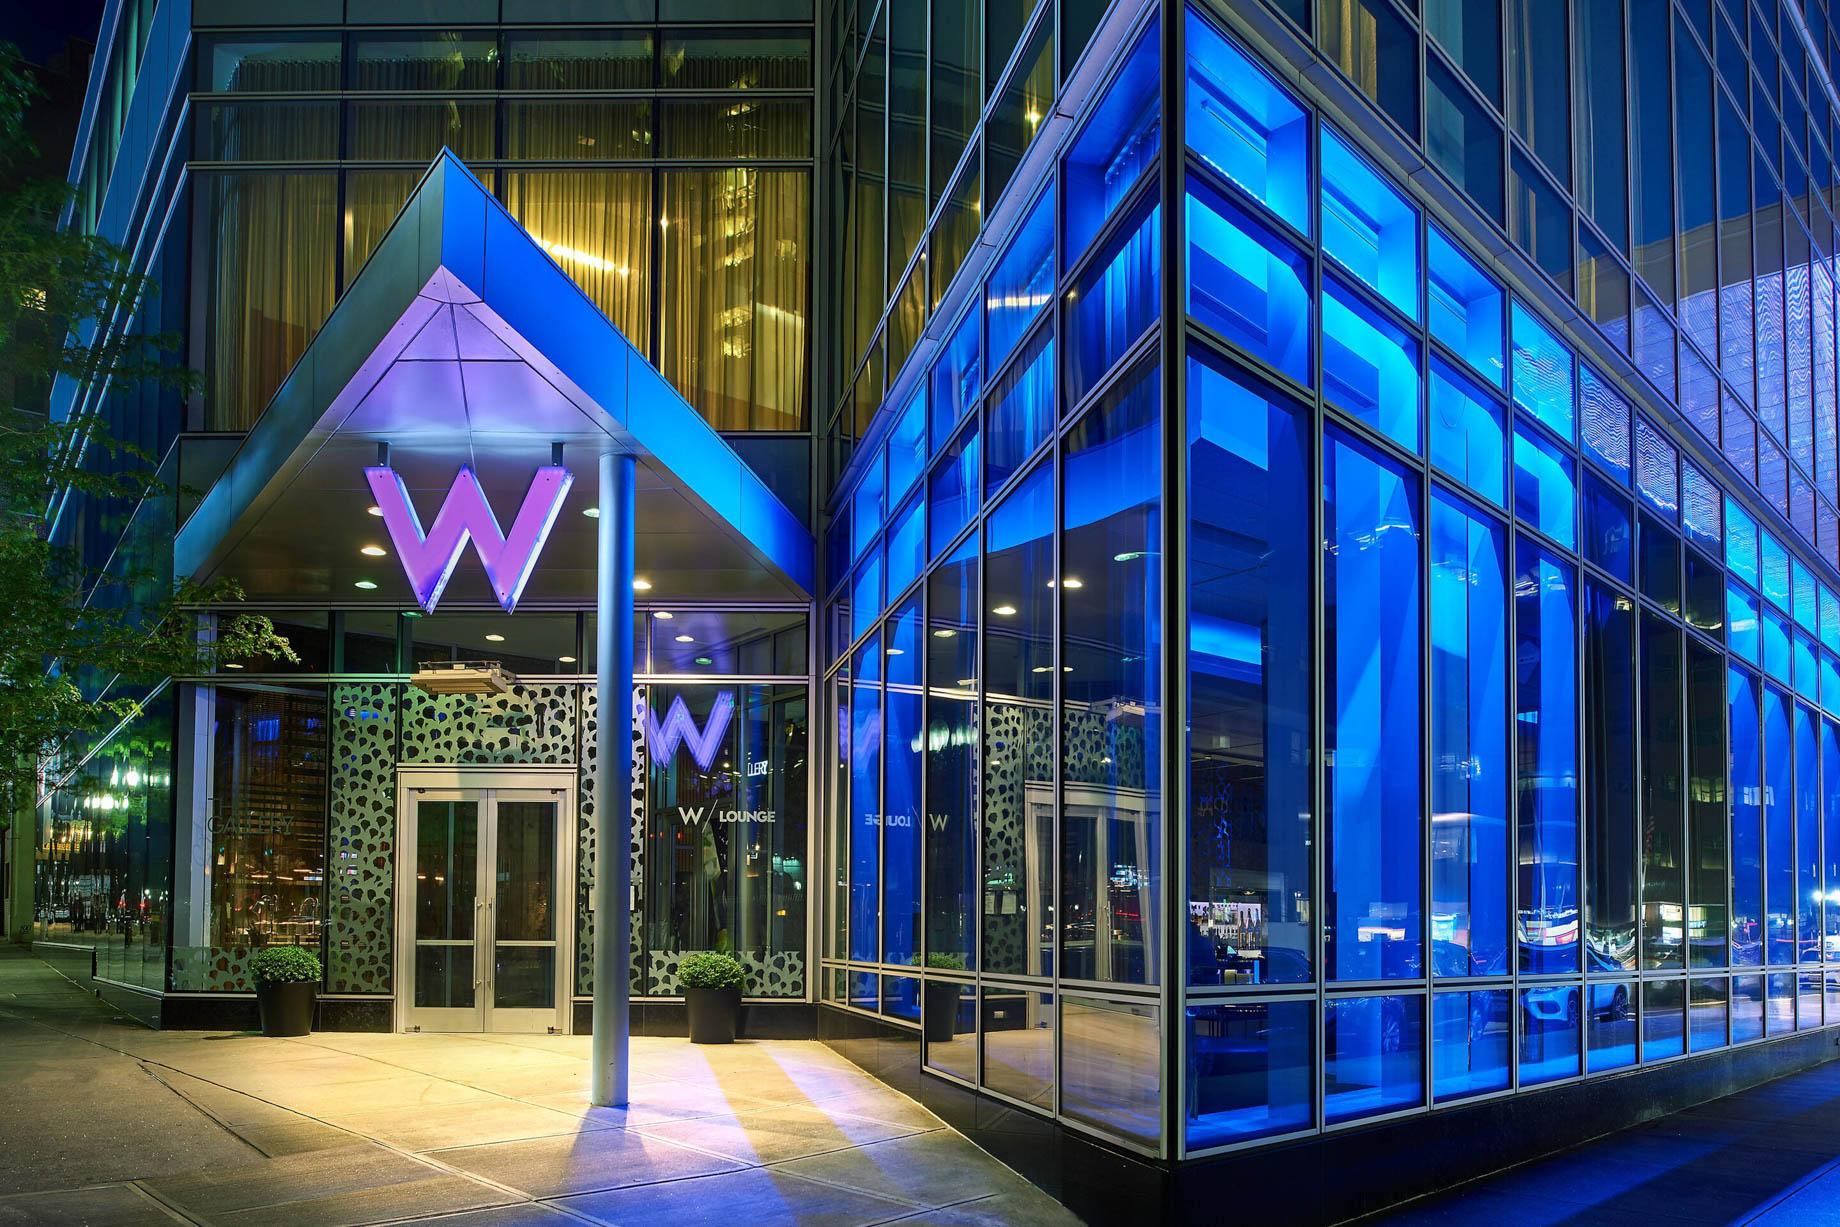 W Boston Luxury Hotel - Boston, MA, USA - Hotel Front Entrance